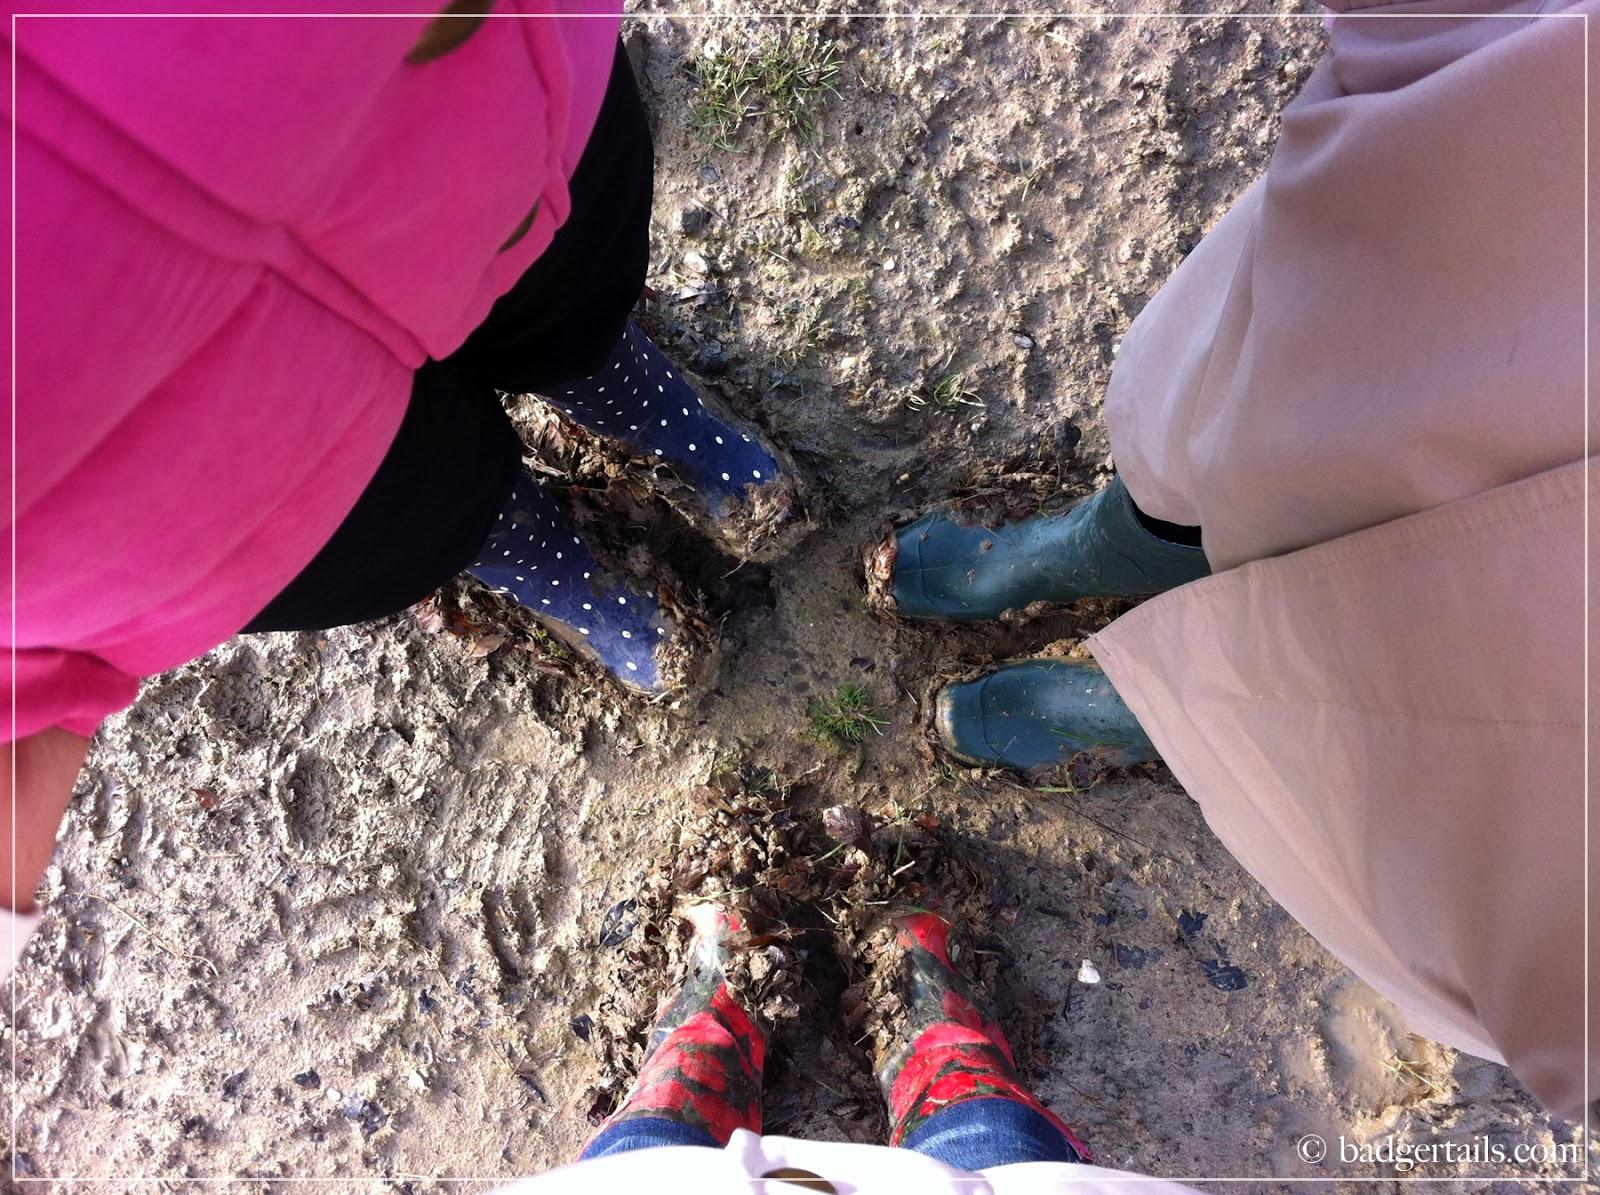 muddy feet in wellies countryside